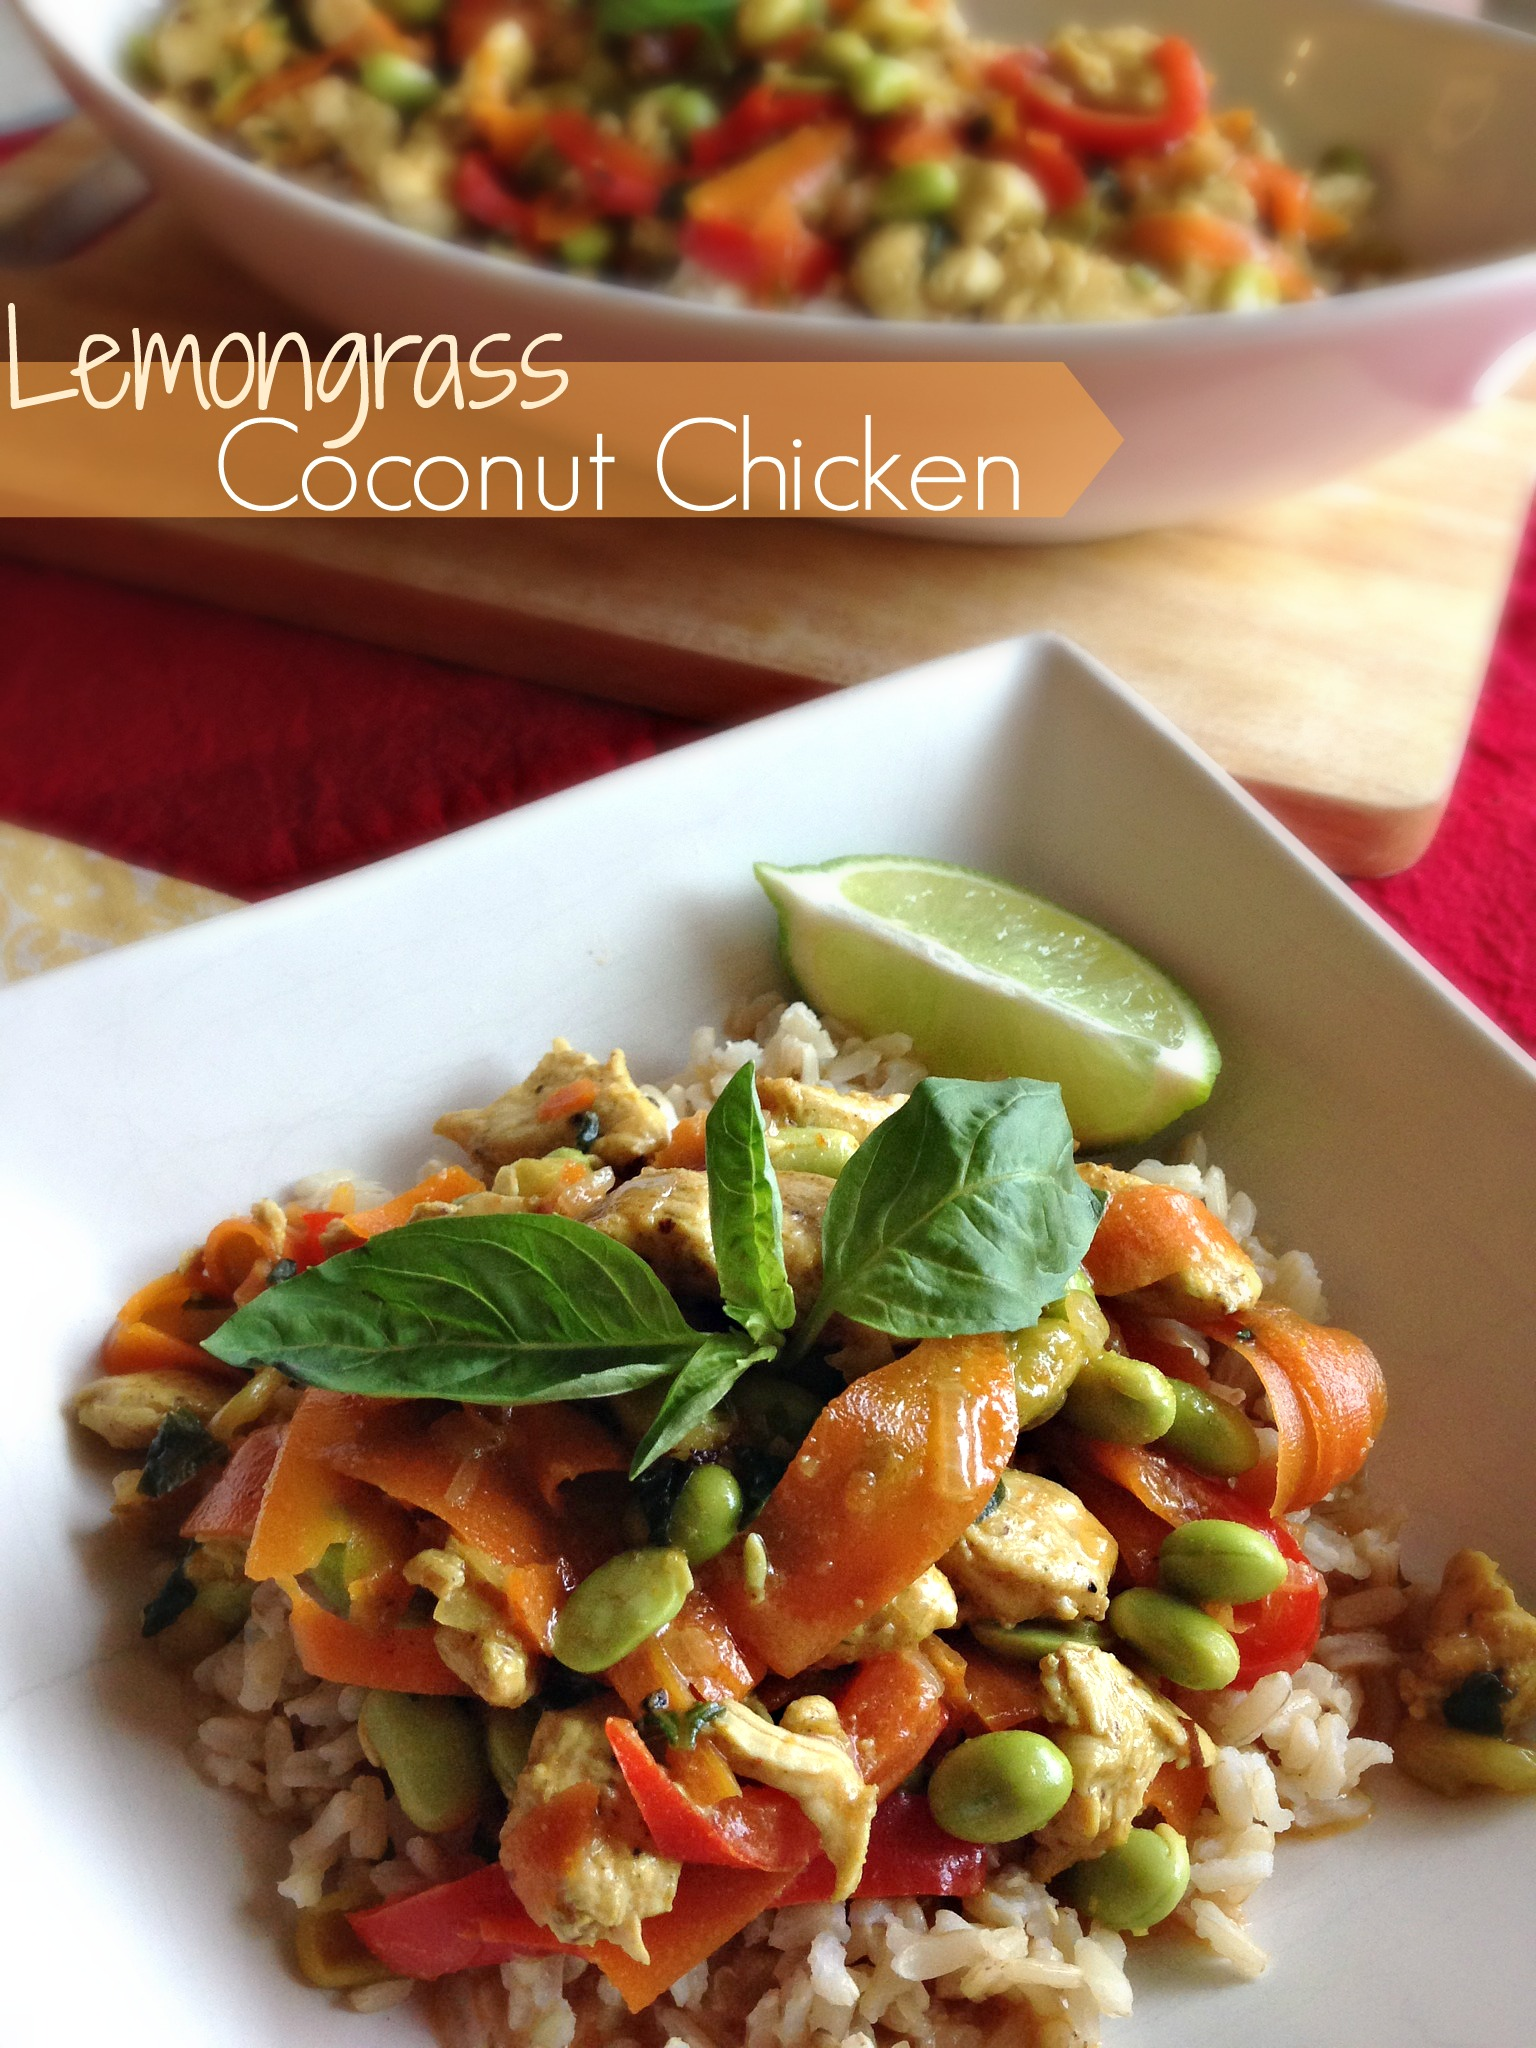 Lemongrass Coconut Chicken